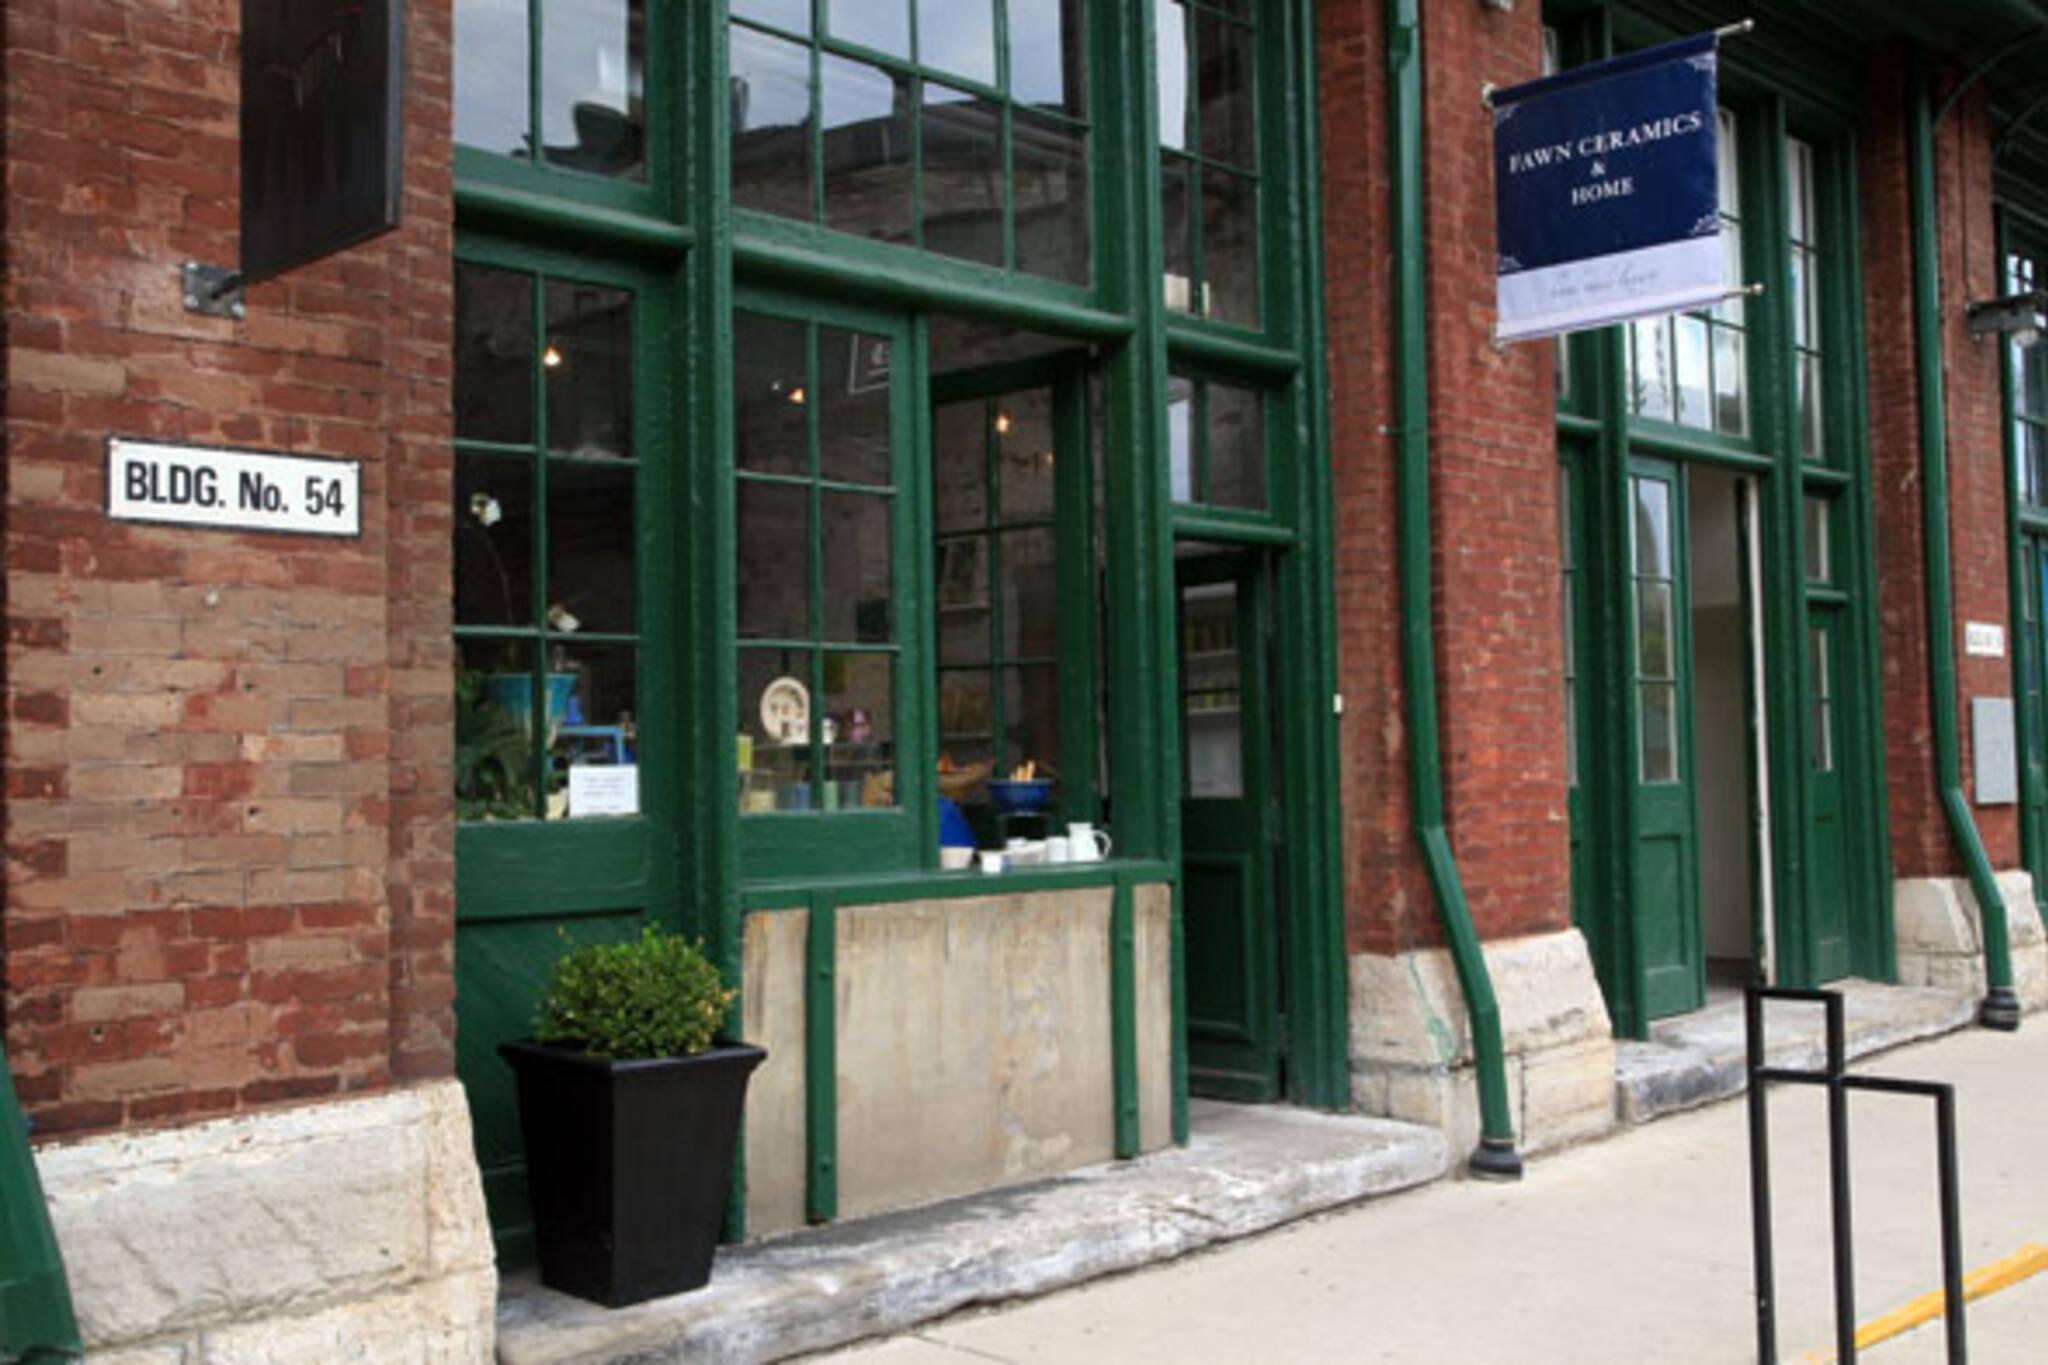 Fawn Ceramics Toronto